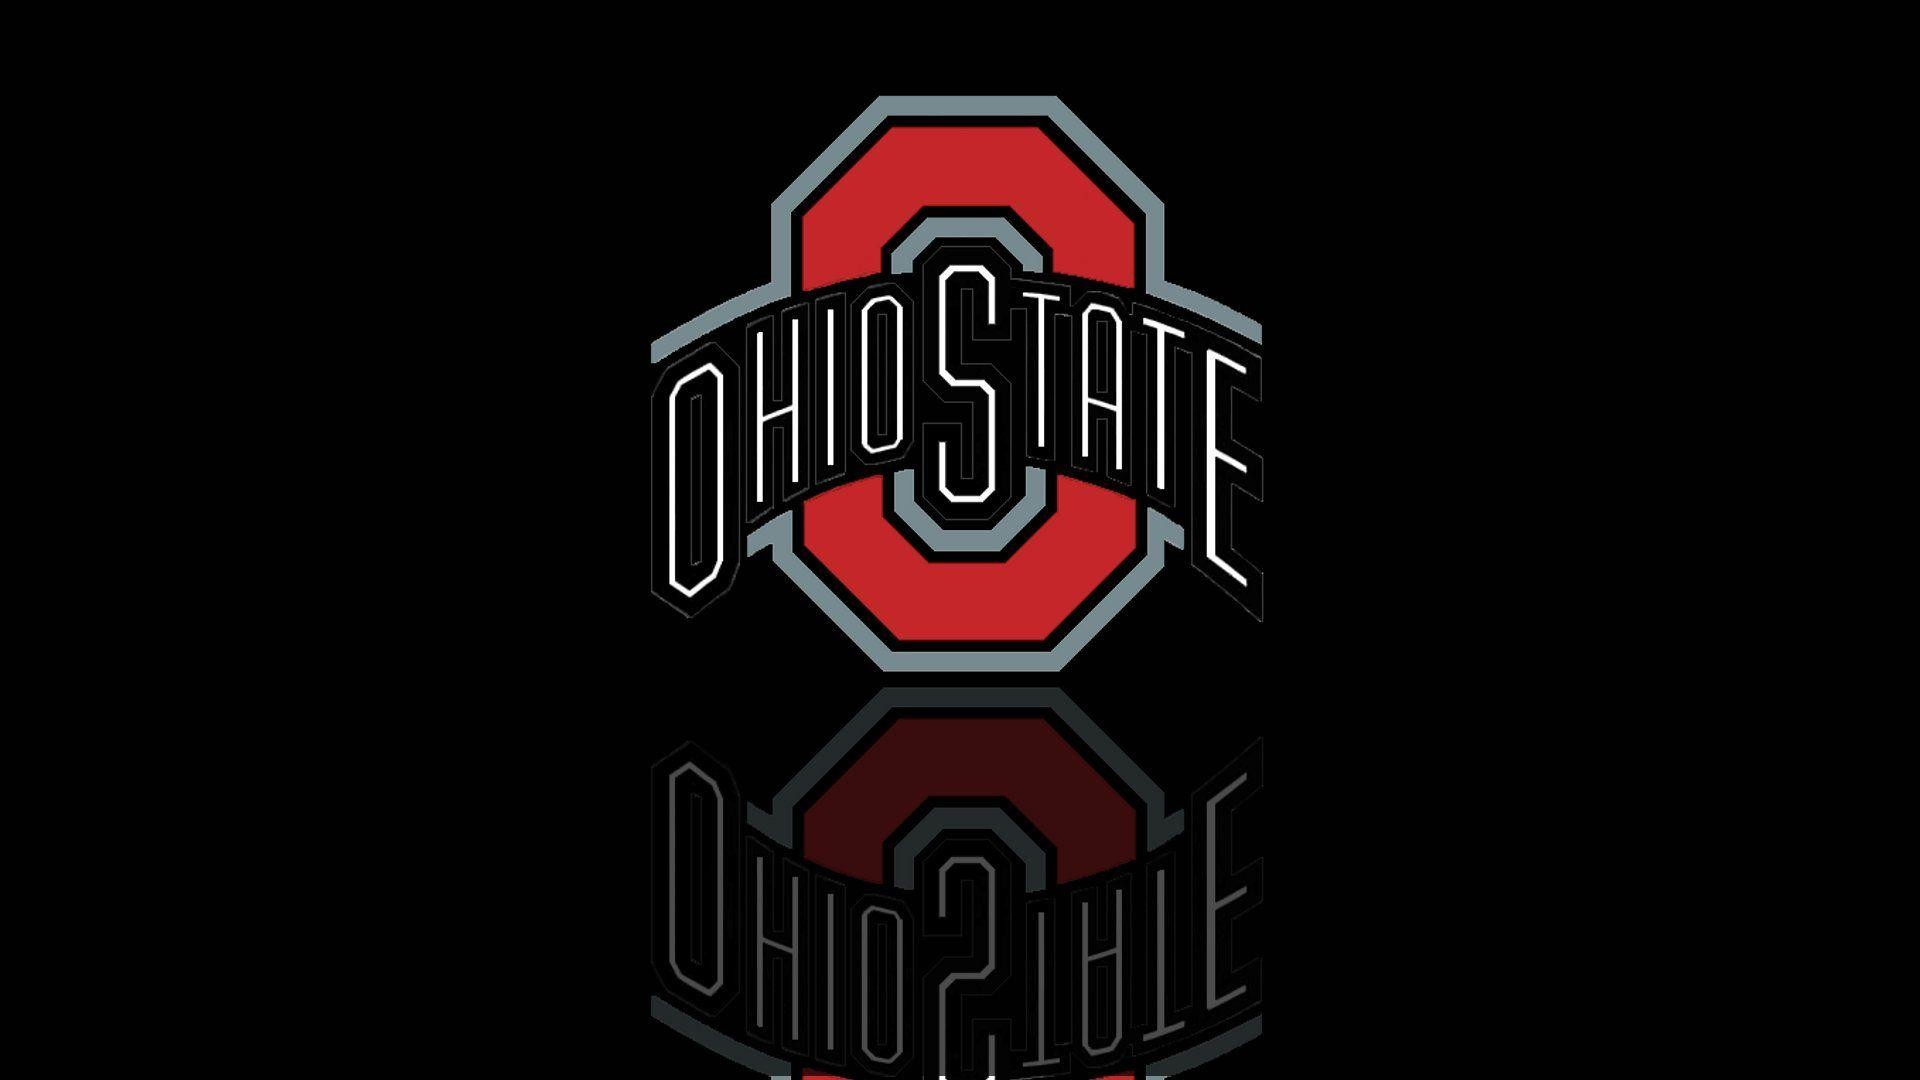 Ohio State 2 – Ohio State Football Wallpaper (28723995) – Fanpop